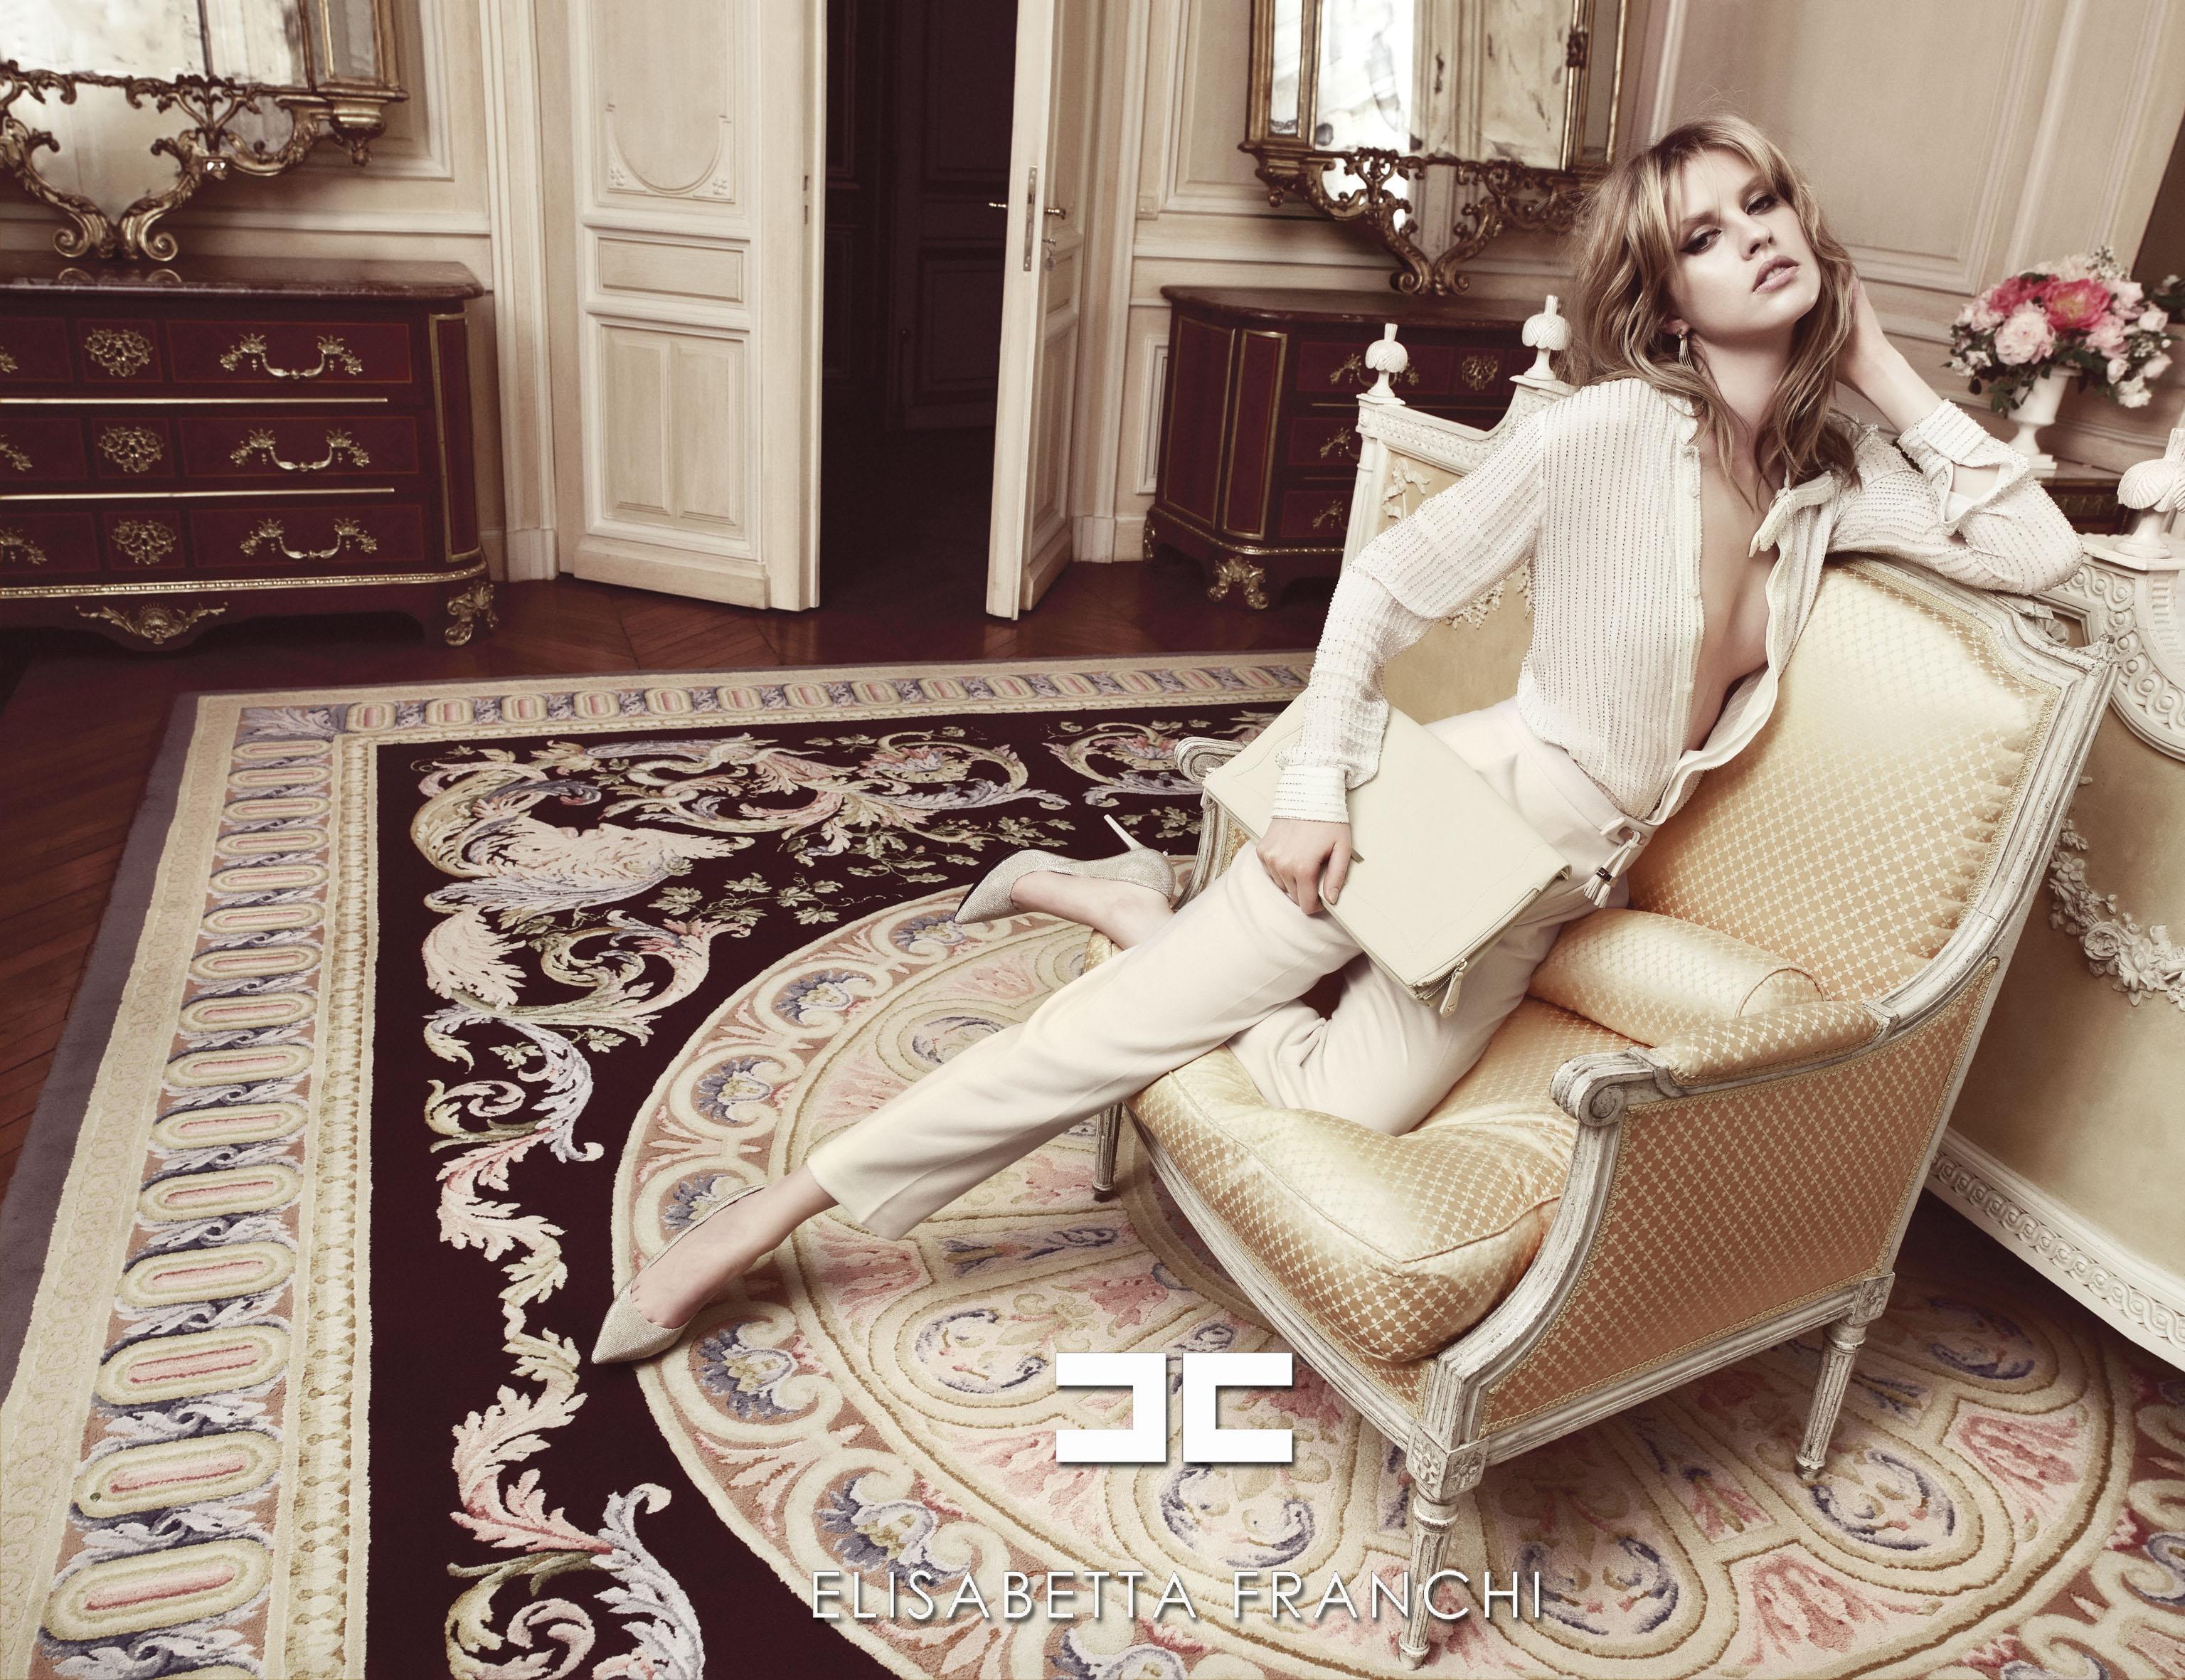 Elisabetta Franchi Fall 2012 | Andoni & Arantxa | Elisabetta Franchi | Numerique Retouch Photo Retouching Studio